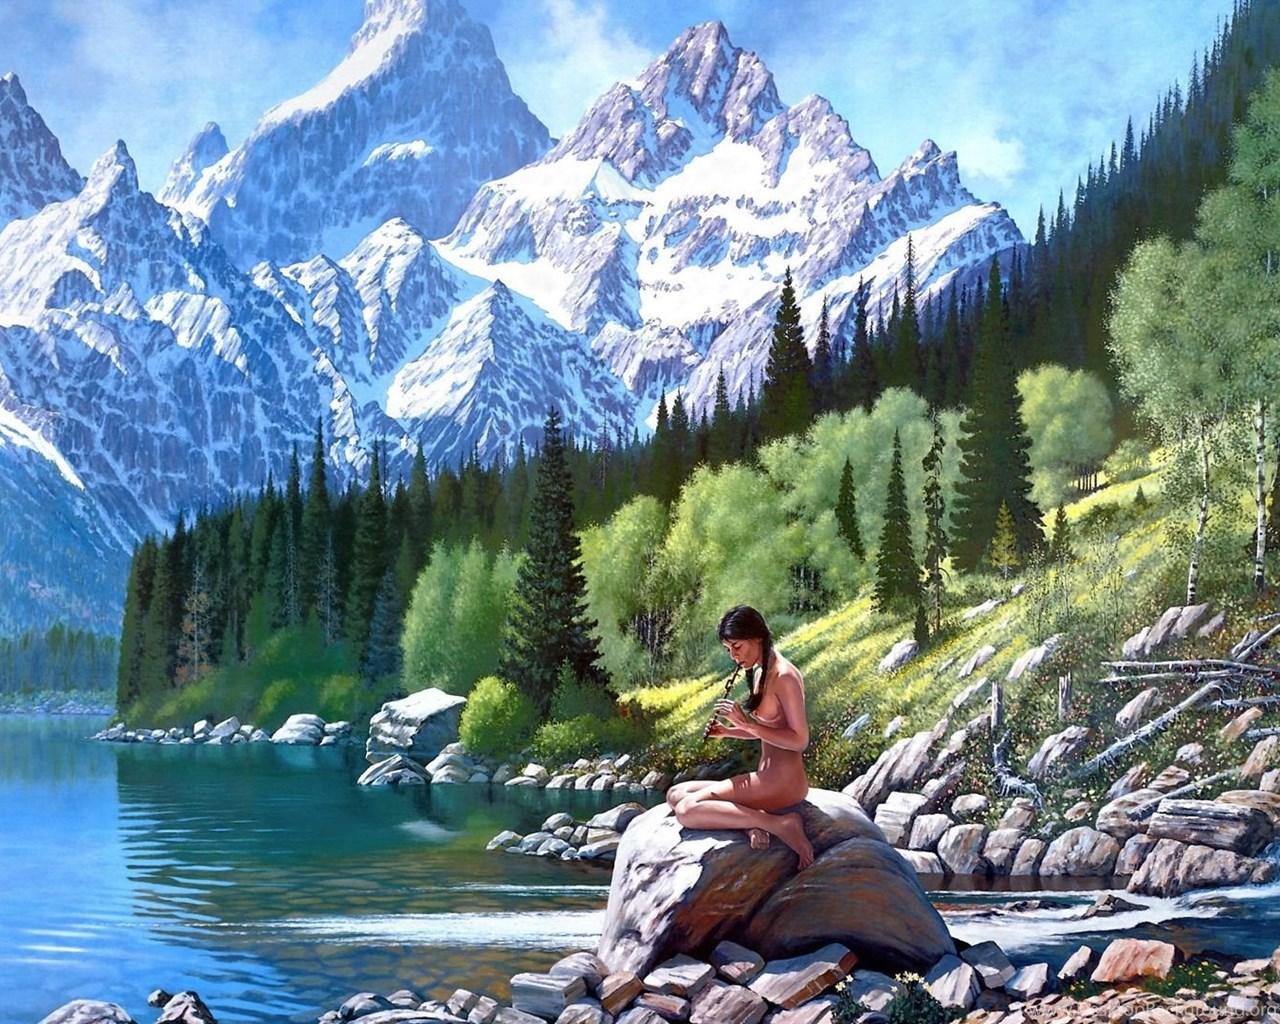 3d Nature Wallpapers For Desktop: Nature Wallpaper: 3d Nature High Resolution Wallpapers